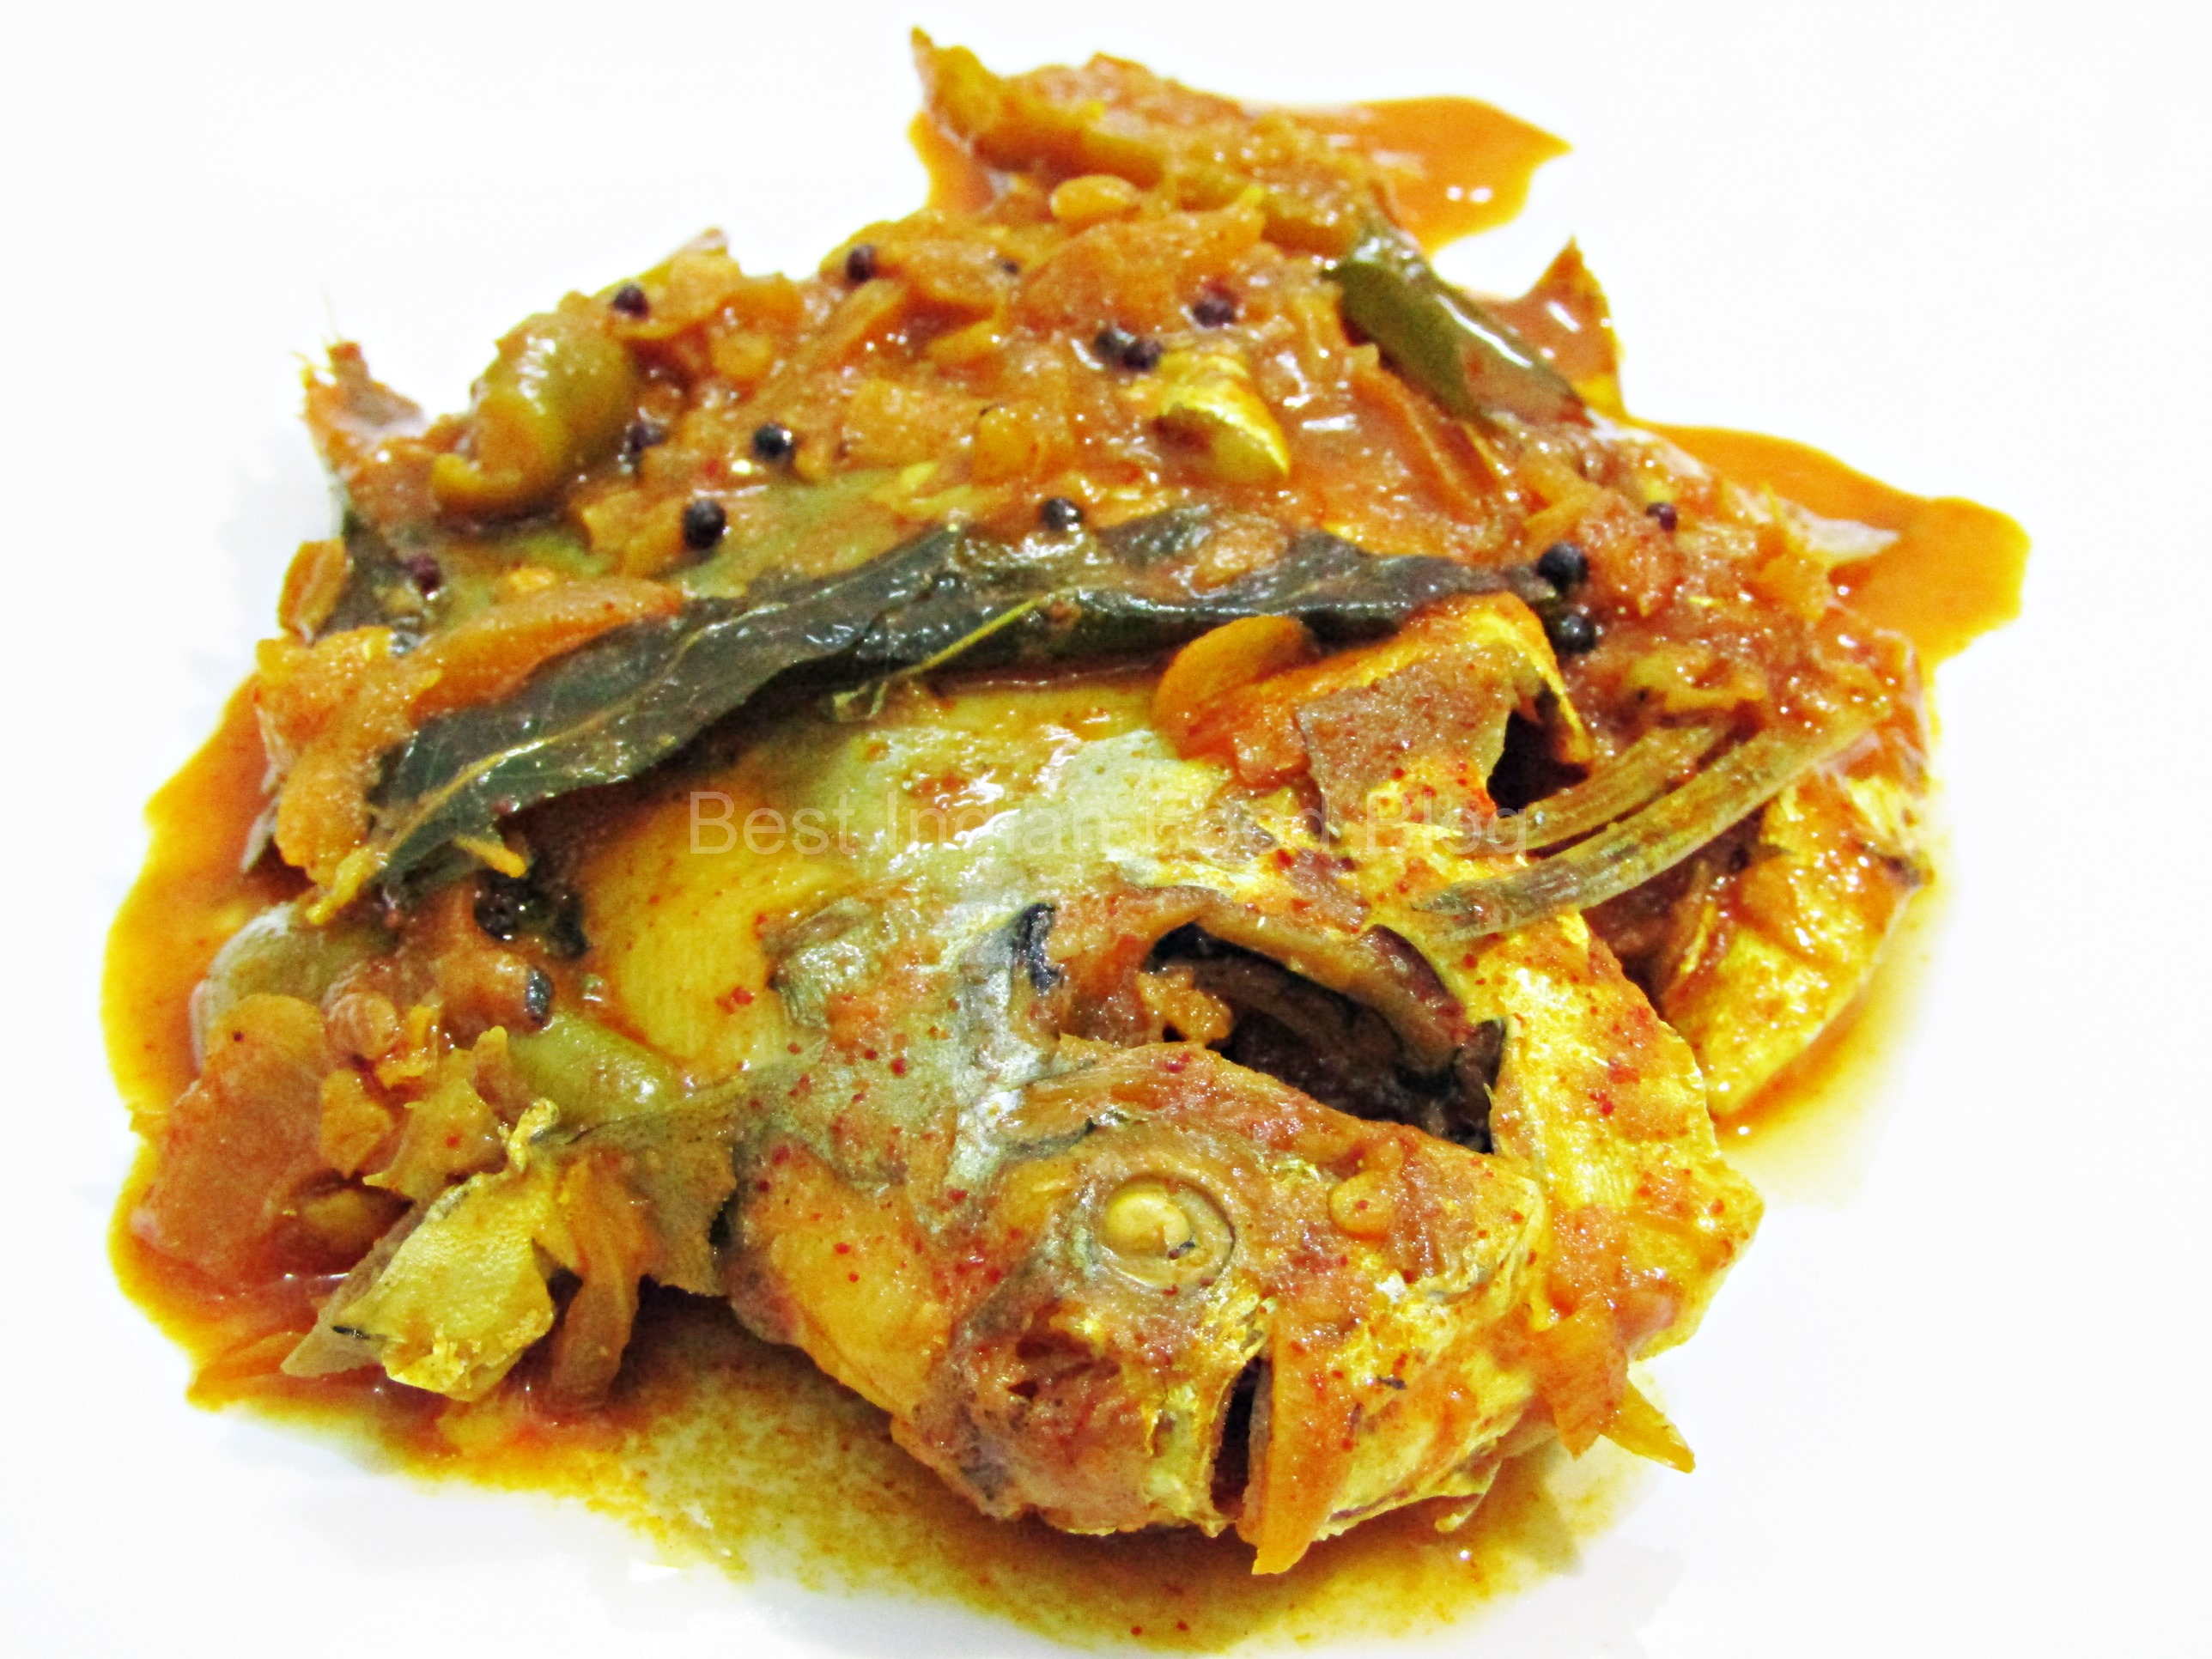 Avoli Meen Curry from Kerala, India | Best Indian Food Blog | Pomfret recipe